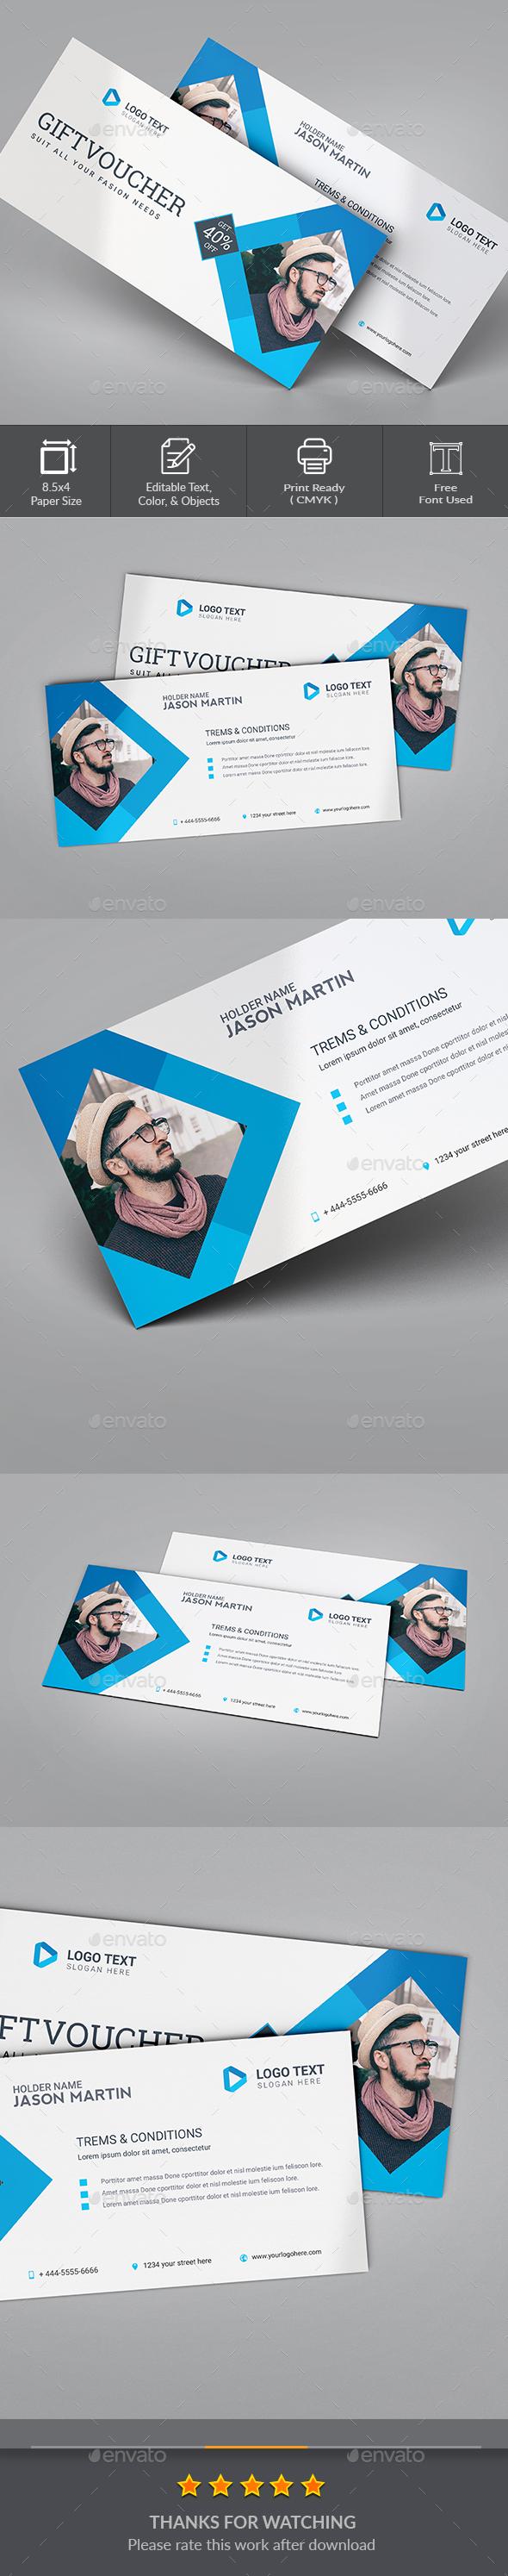 GraphicRiver Gift Voucher 20568095